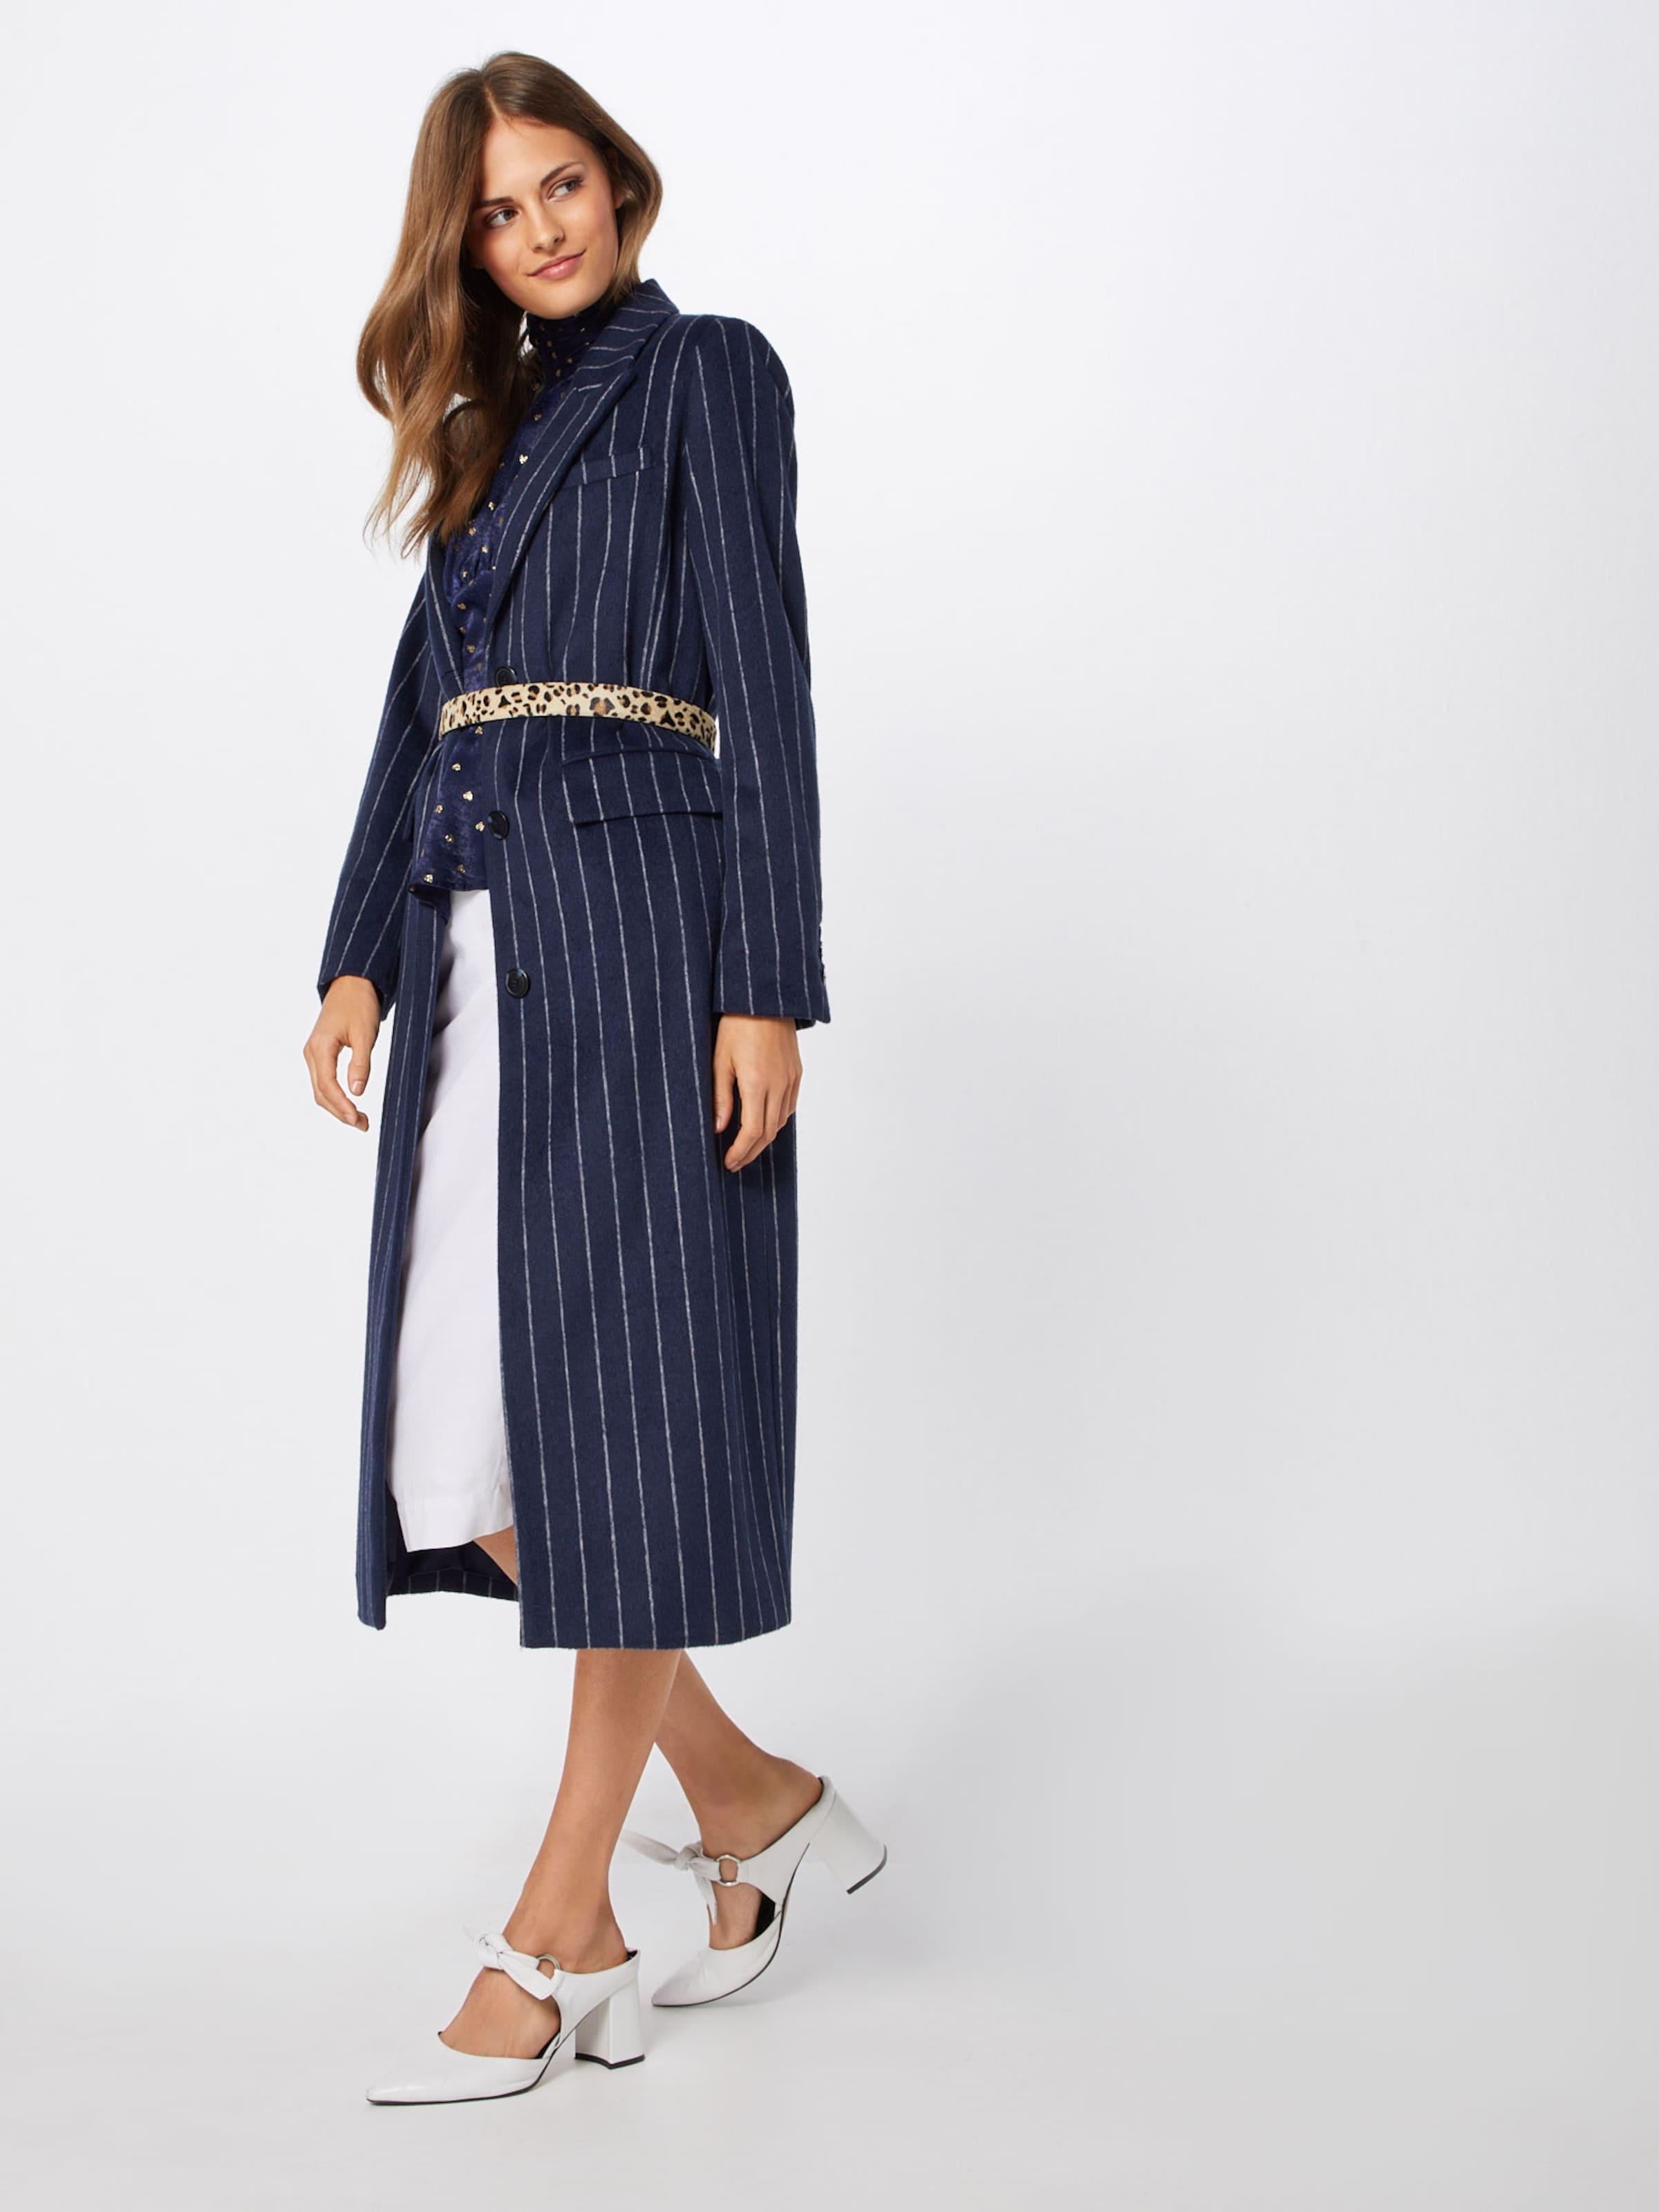 Chemisier Union MarineOr Bleu En 'rubina' Fashion uOkXlwPZiT